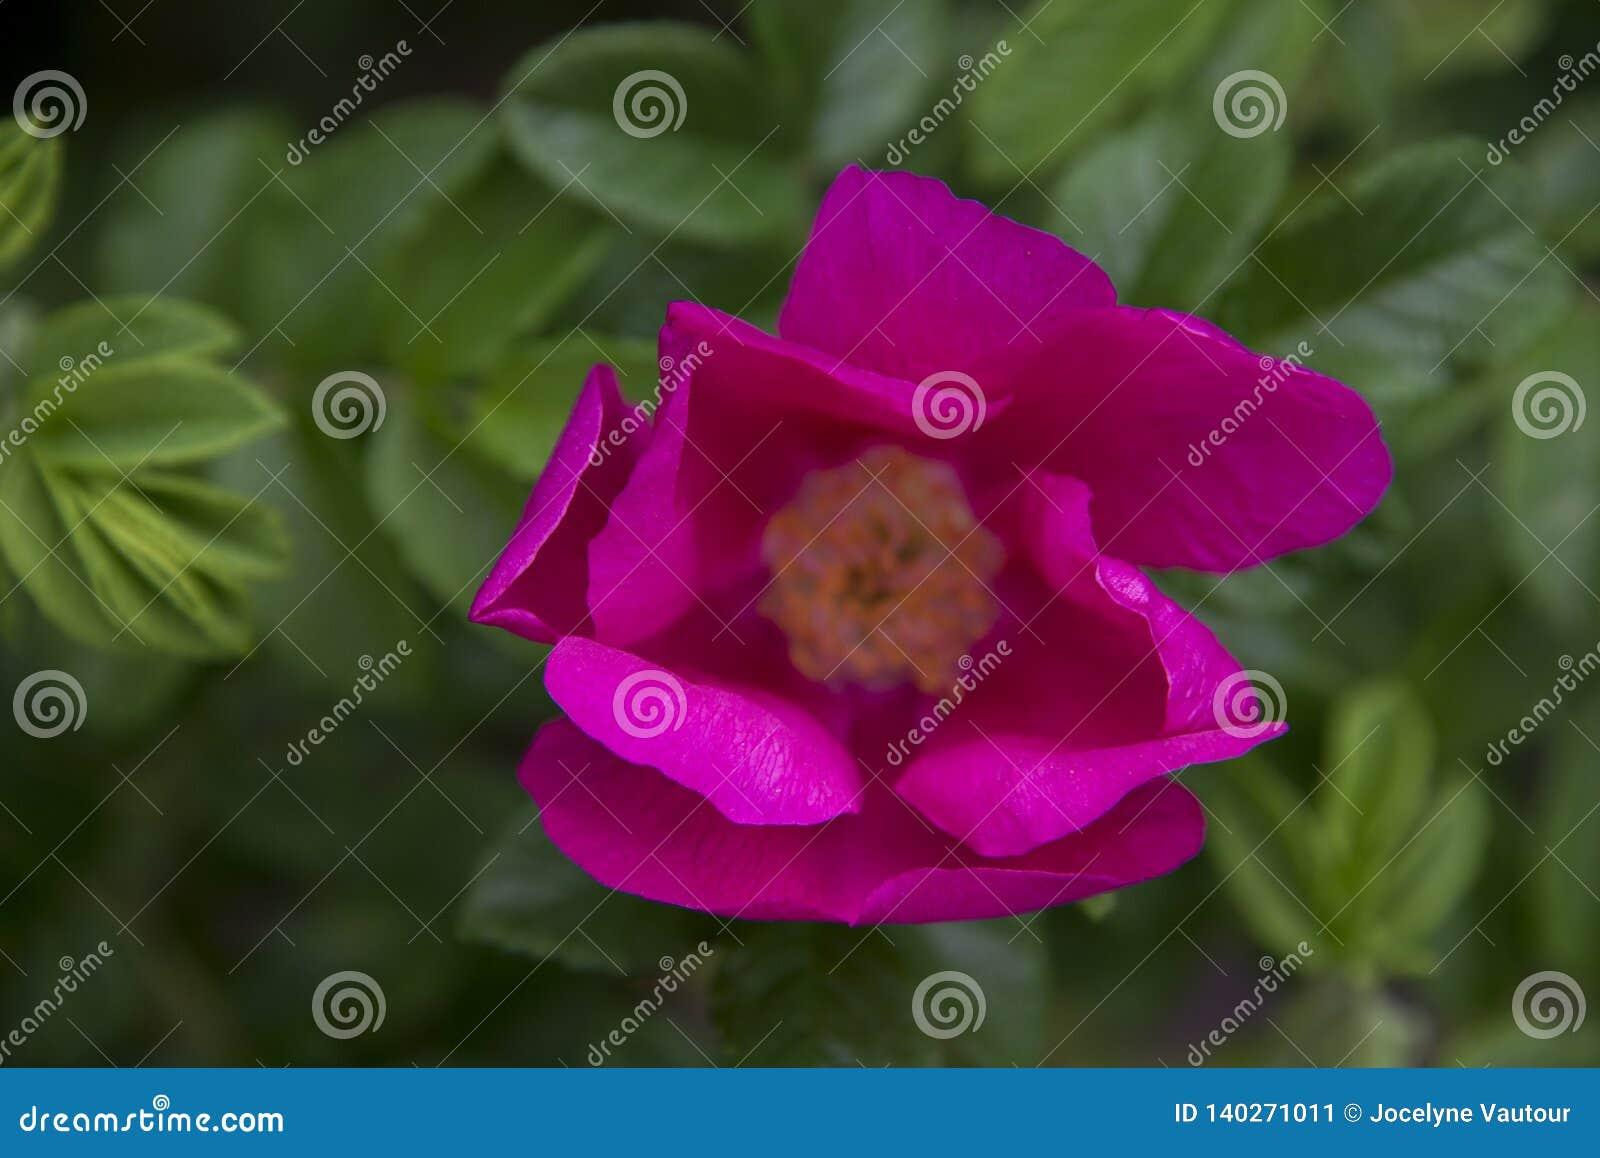 Fuchsia petals from a wild rose